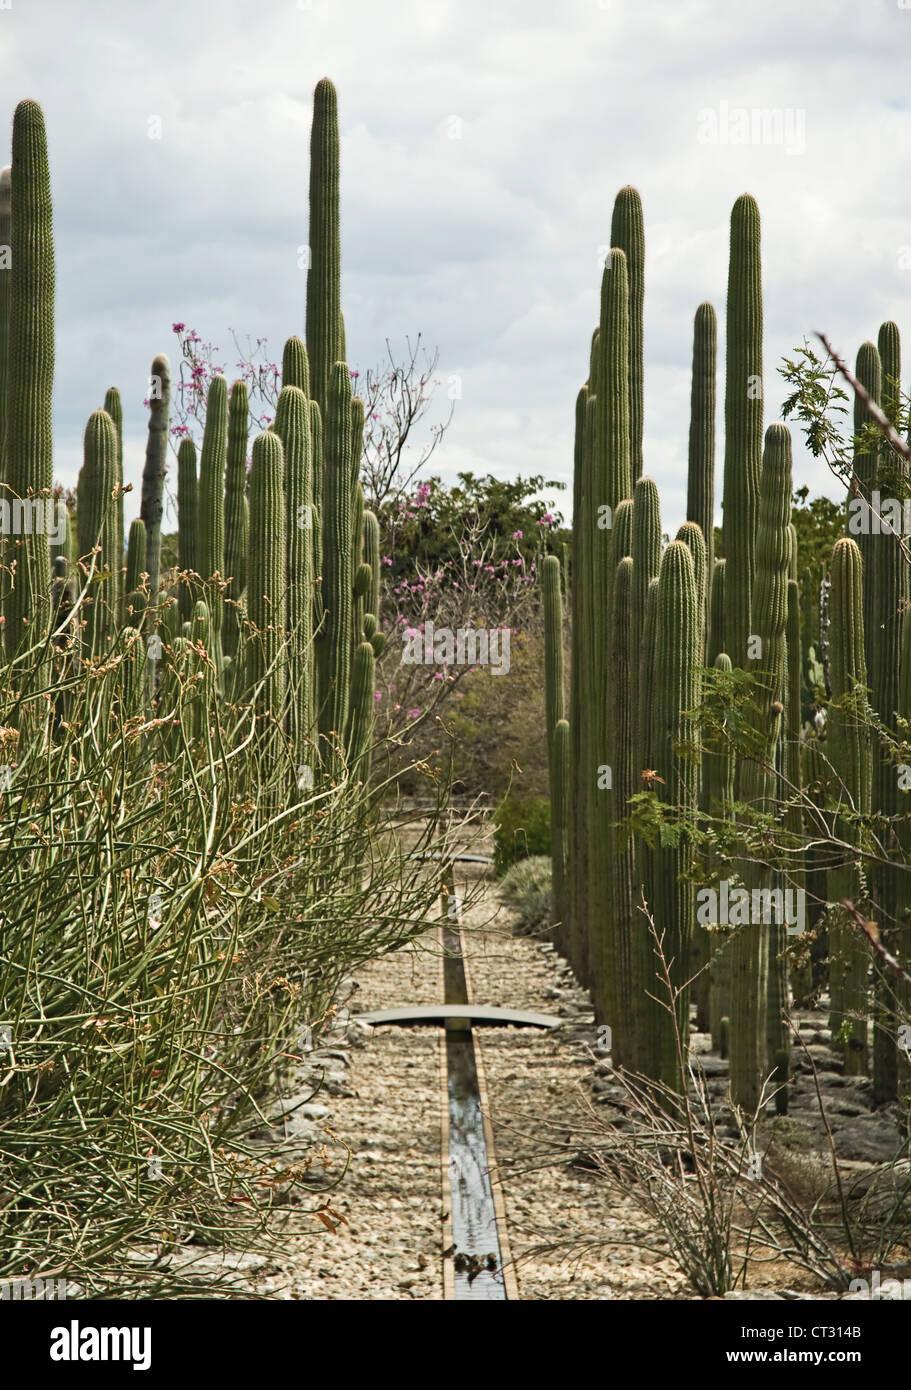 Carnegiea Gigantea, Kaktus, Saguaro Kaktus Stockfoto